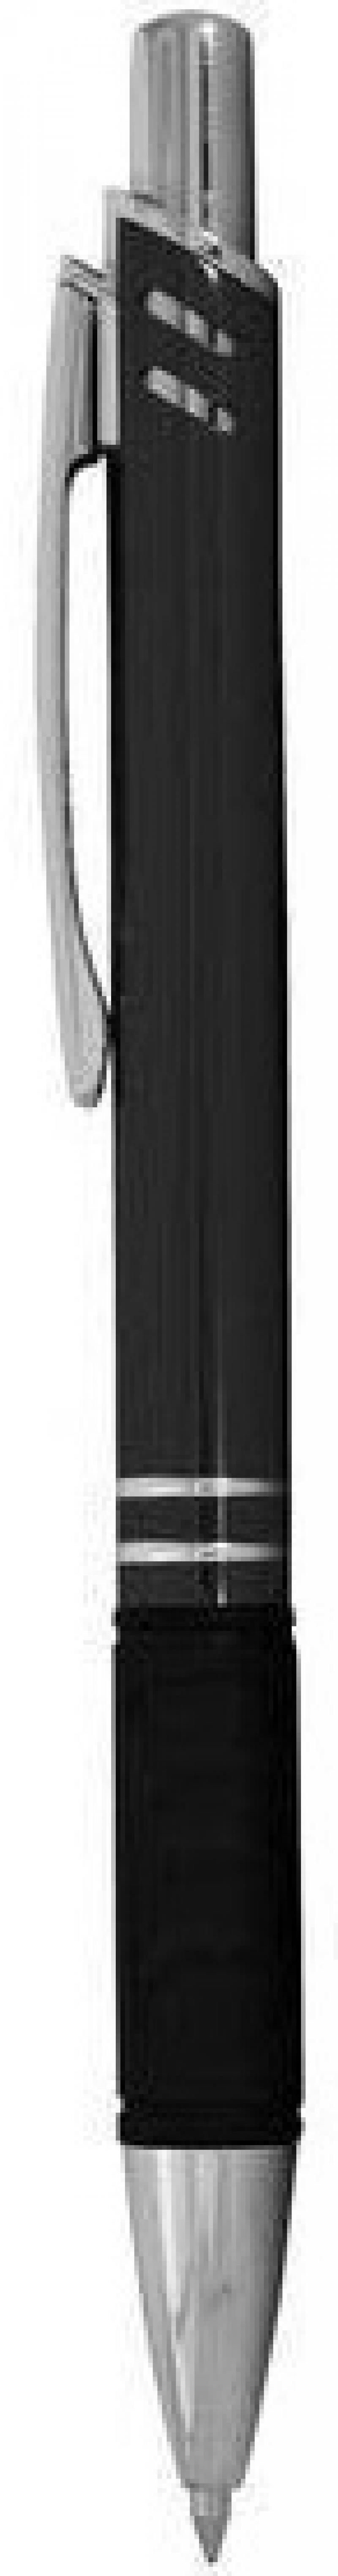 Шариковая ручка автоматическая Index IMWT1134/BK/бшк синий 0.5 мм IMWT1134/BK/бшк монитор benq 24 gl2450hm bk bk 9h l7cla rbe